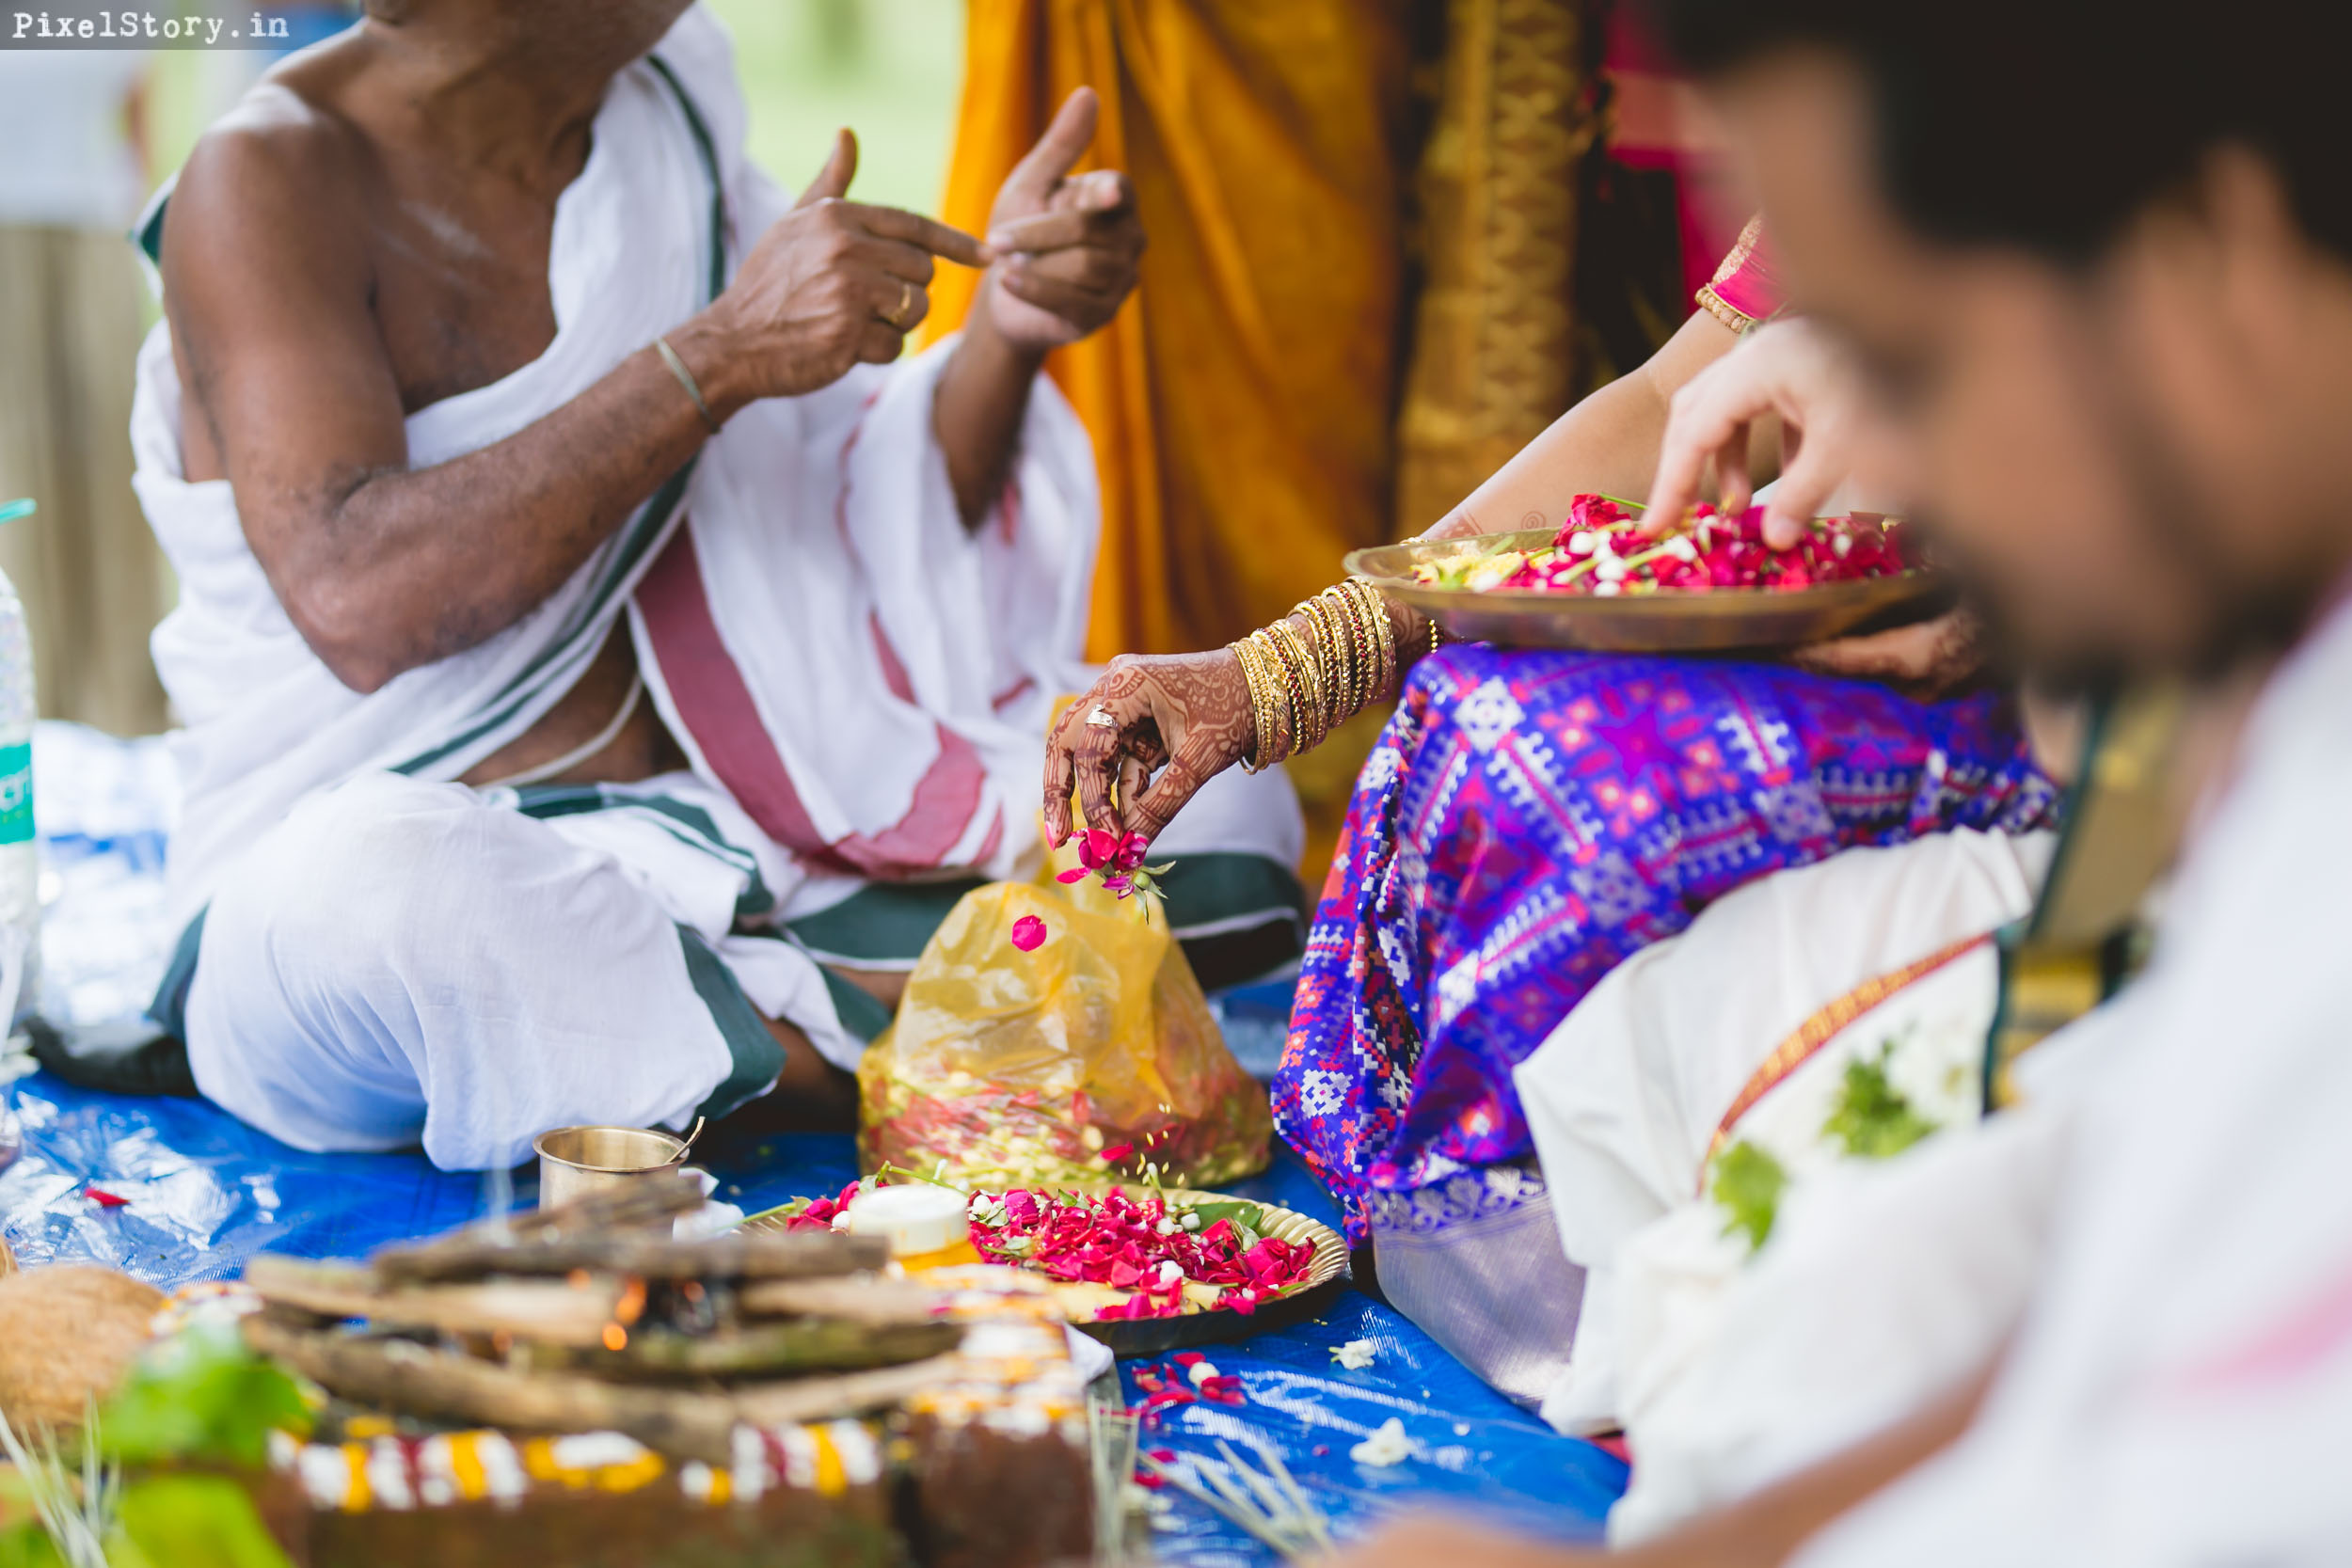 PixelStory-Jungle-Wedding-Photographer-Masinagudi-Indo-French058.jpg